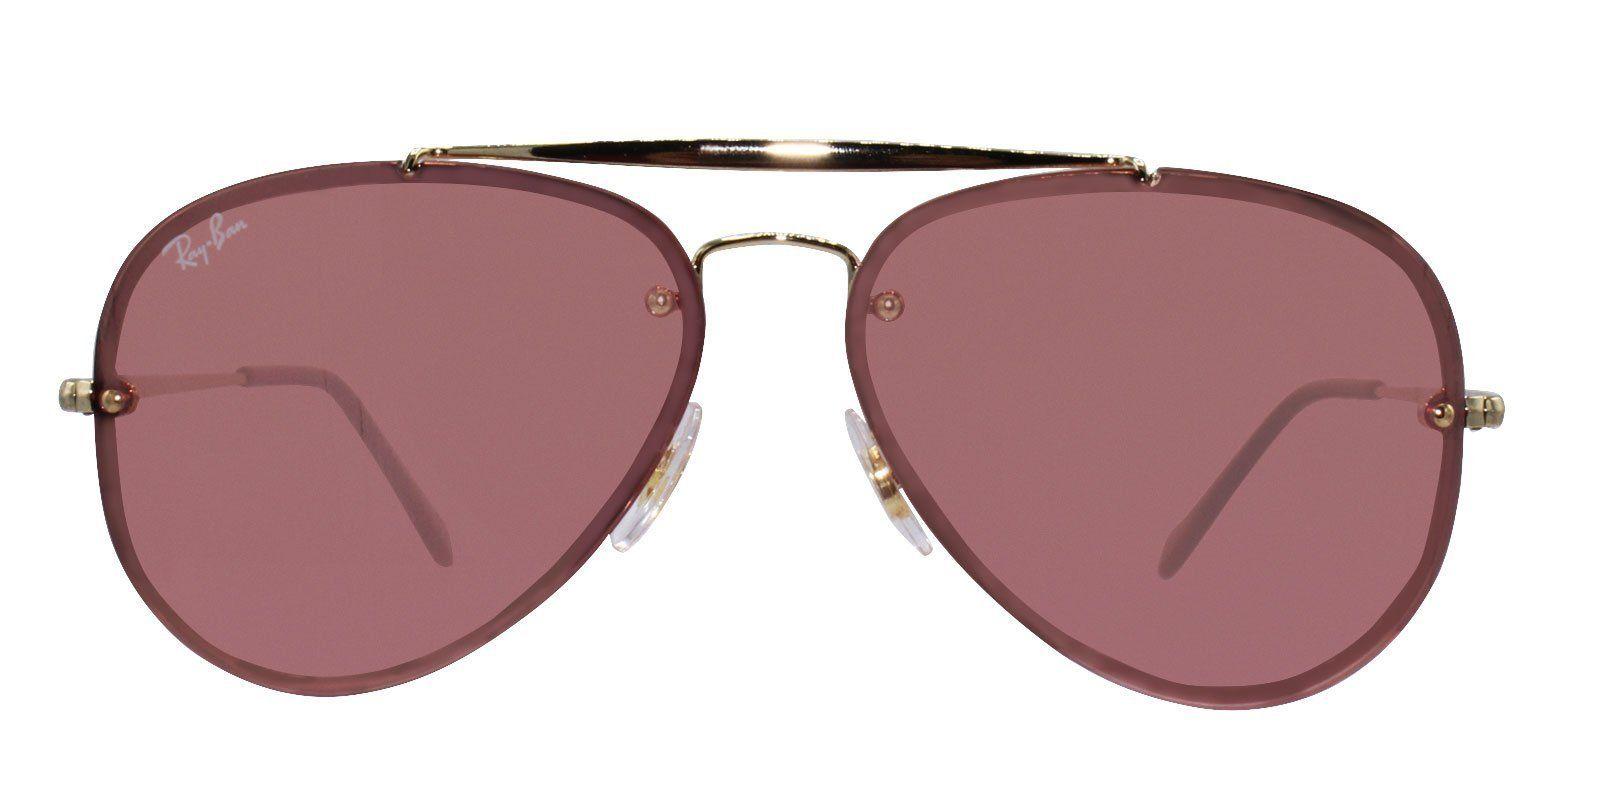 0ed2f83999 Ray Ban - RB3584N Gold - Pink sunglasses